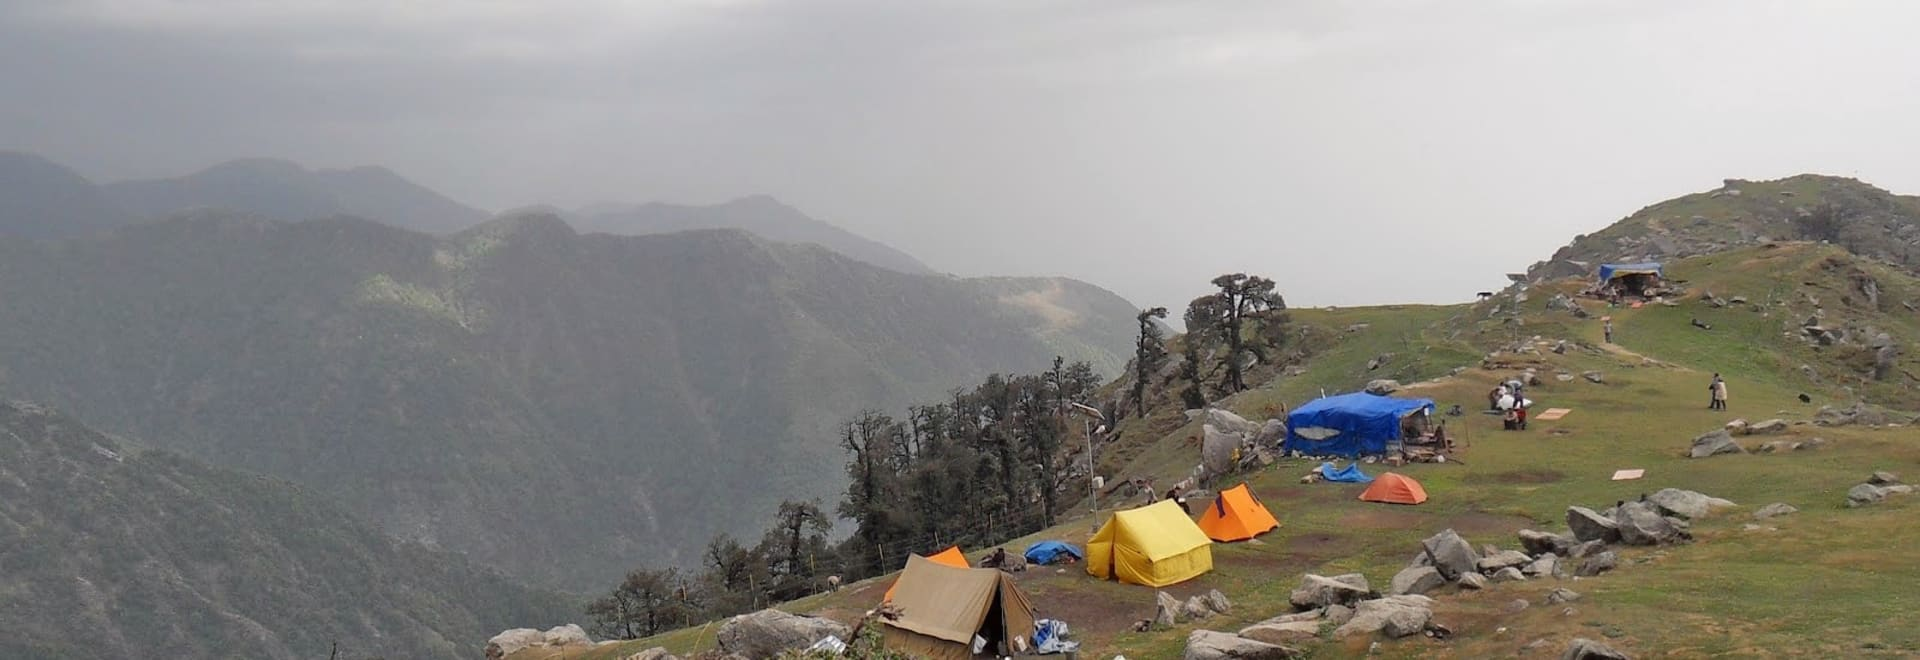 1464189979_triund_camping.jpg